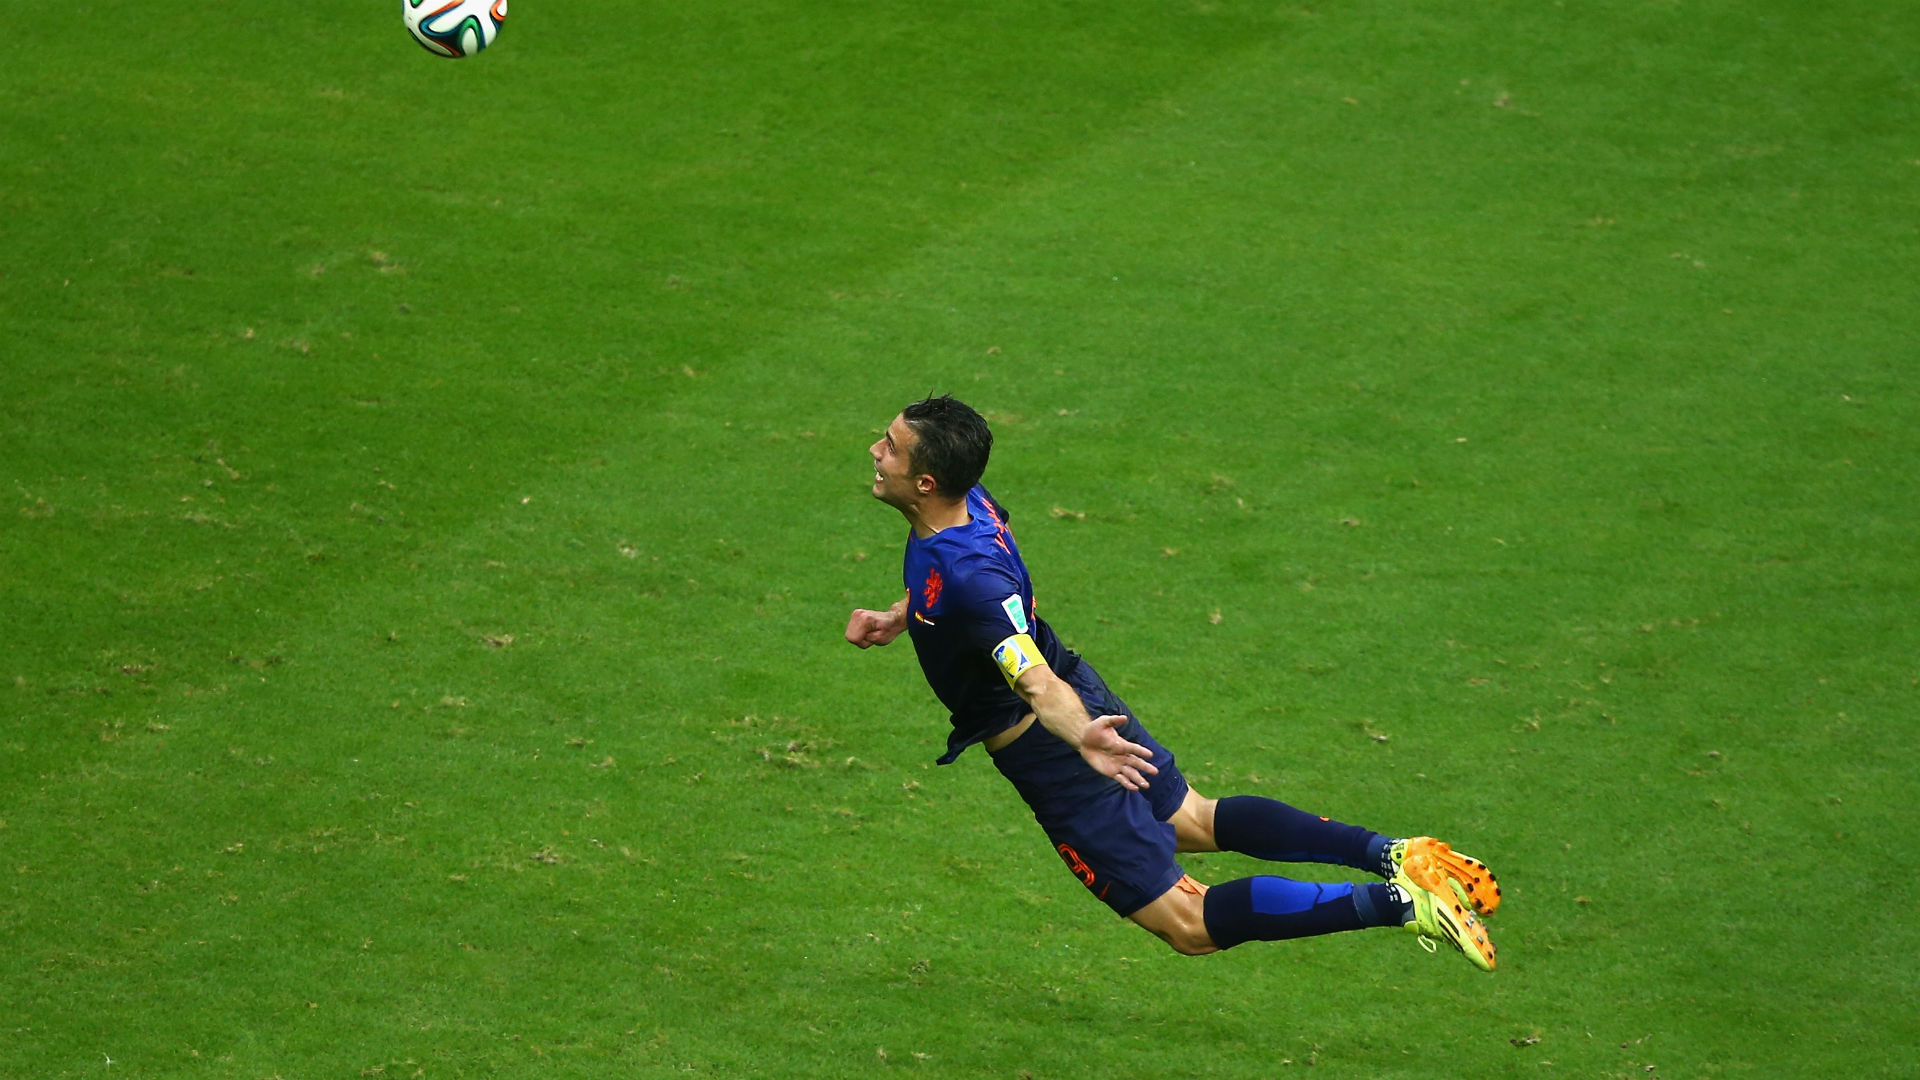 World Cup flashback: Spain 1-5 Netherlands (2014)